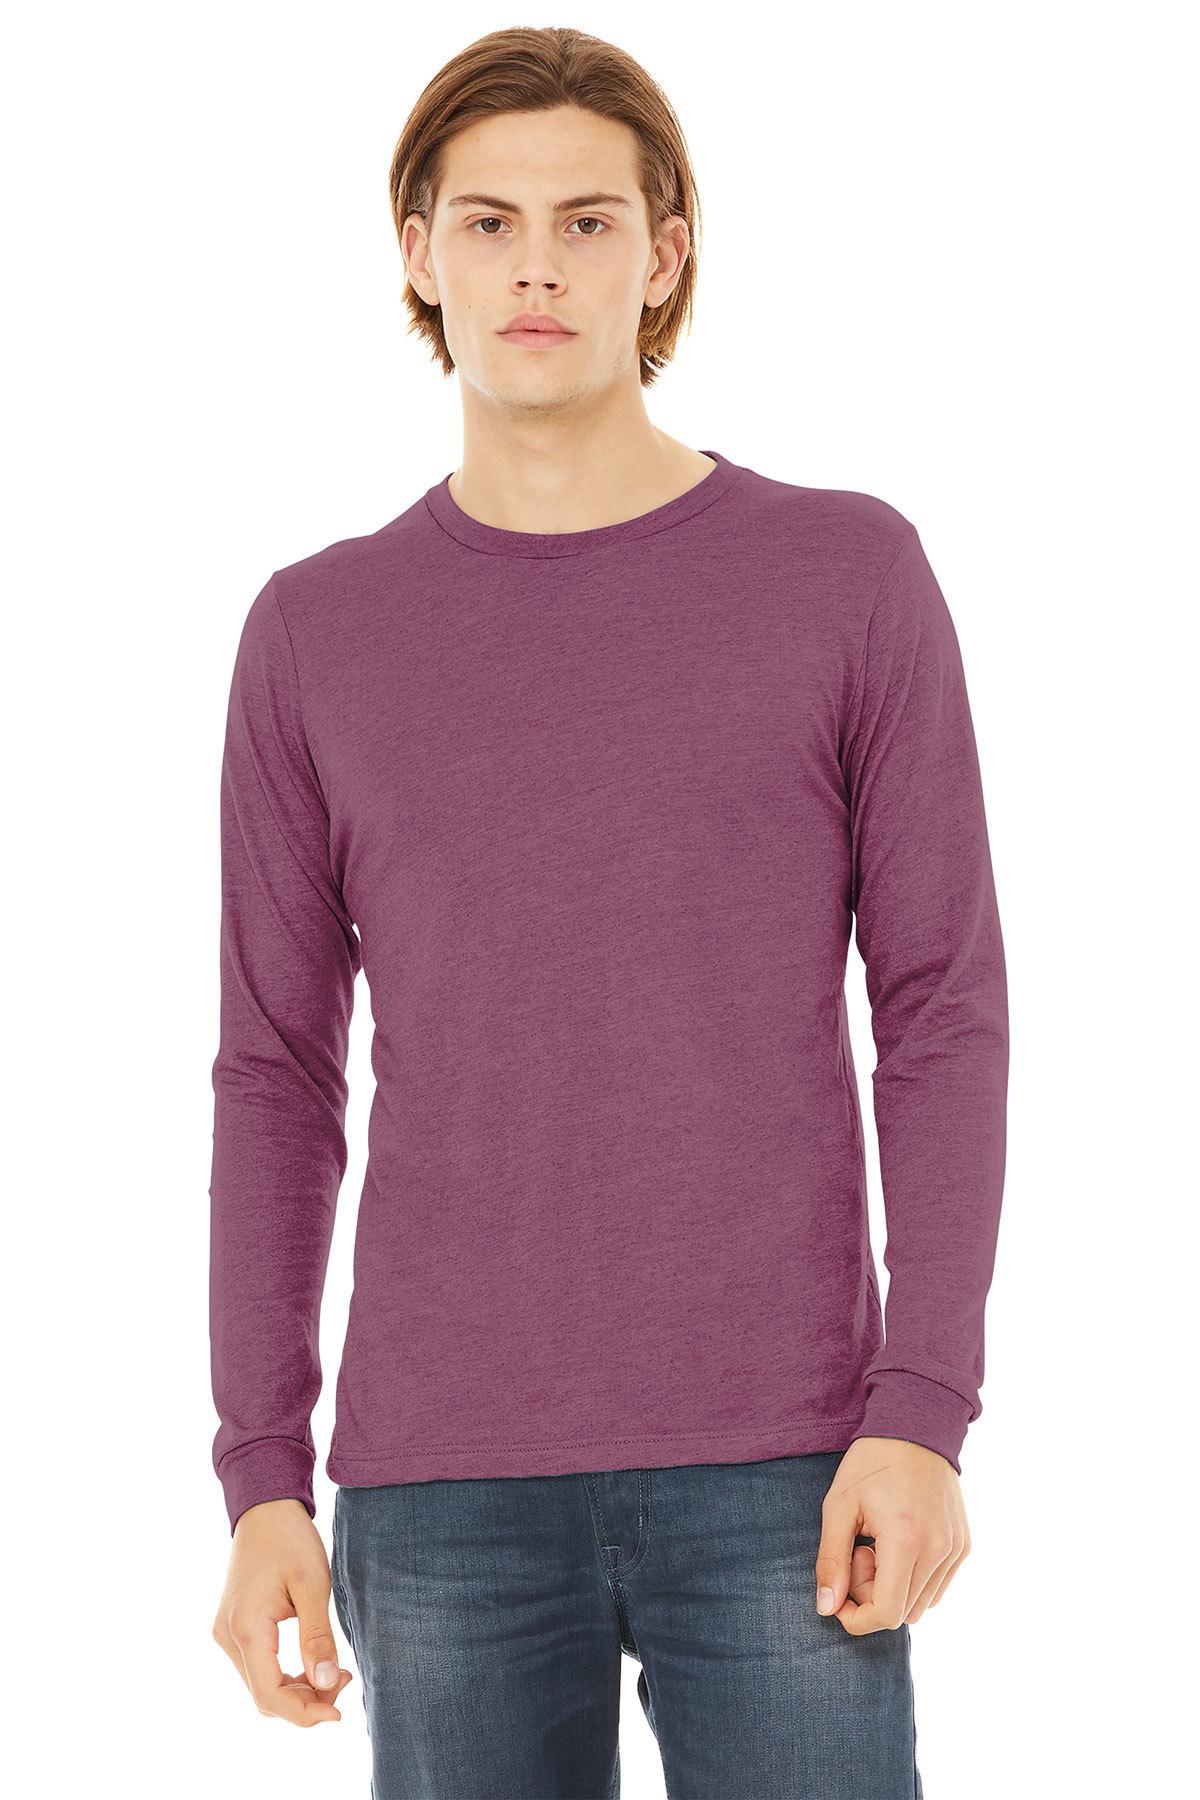 9f3c3539cb40e BELLA+CANVAS ® Unisex Jersey Long Sleeve Tee   Long Sleeve   T ...